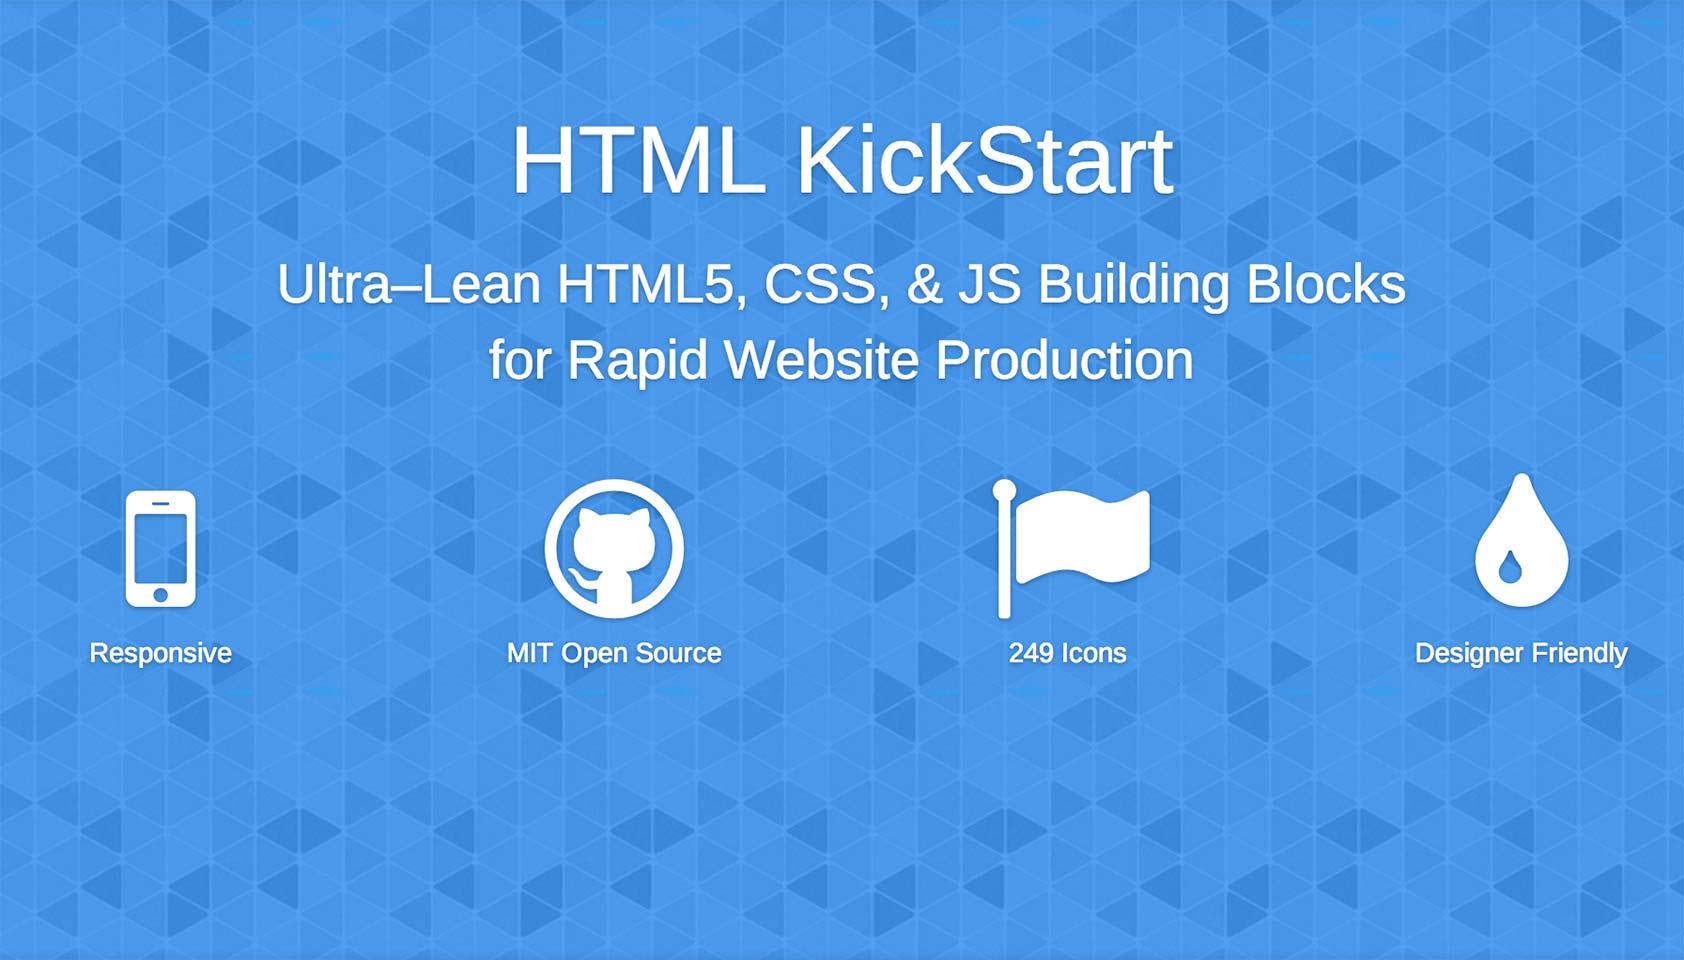 How to Kickstart your HTML